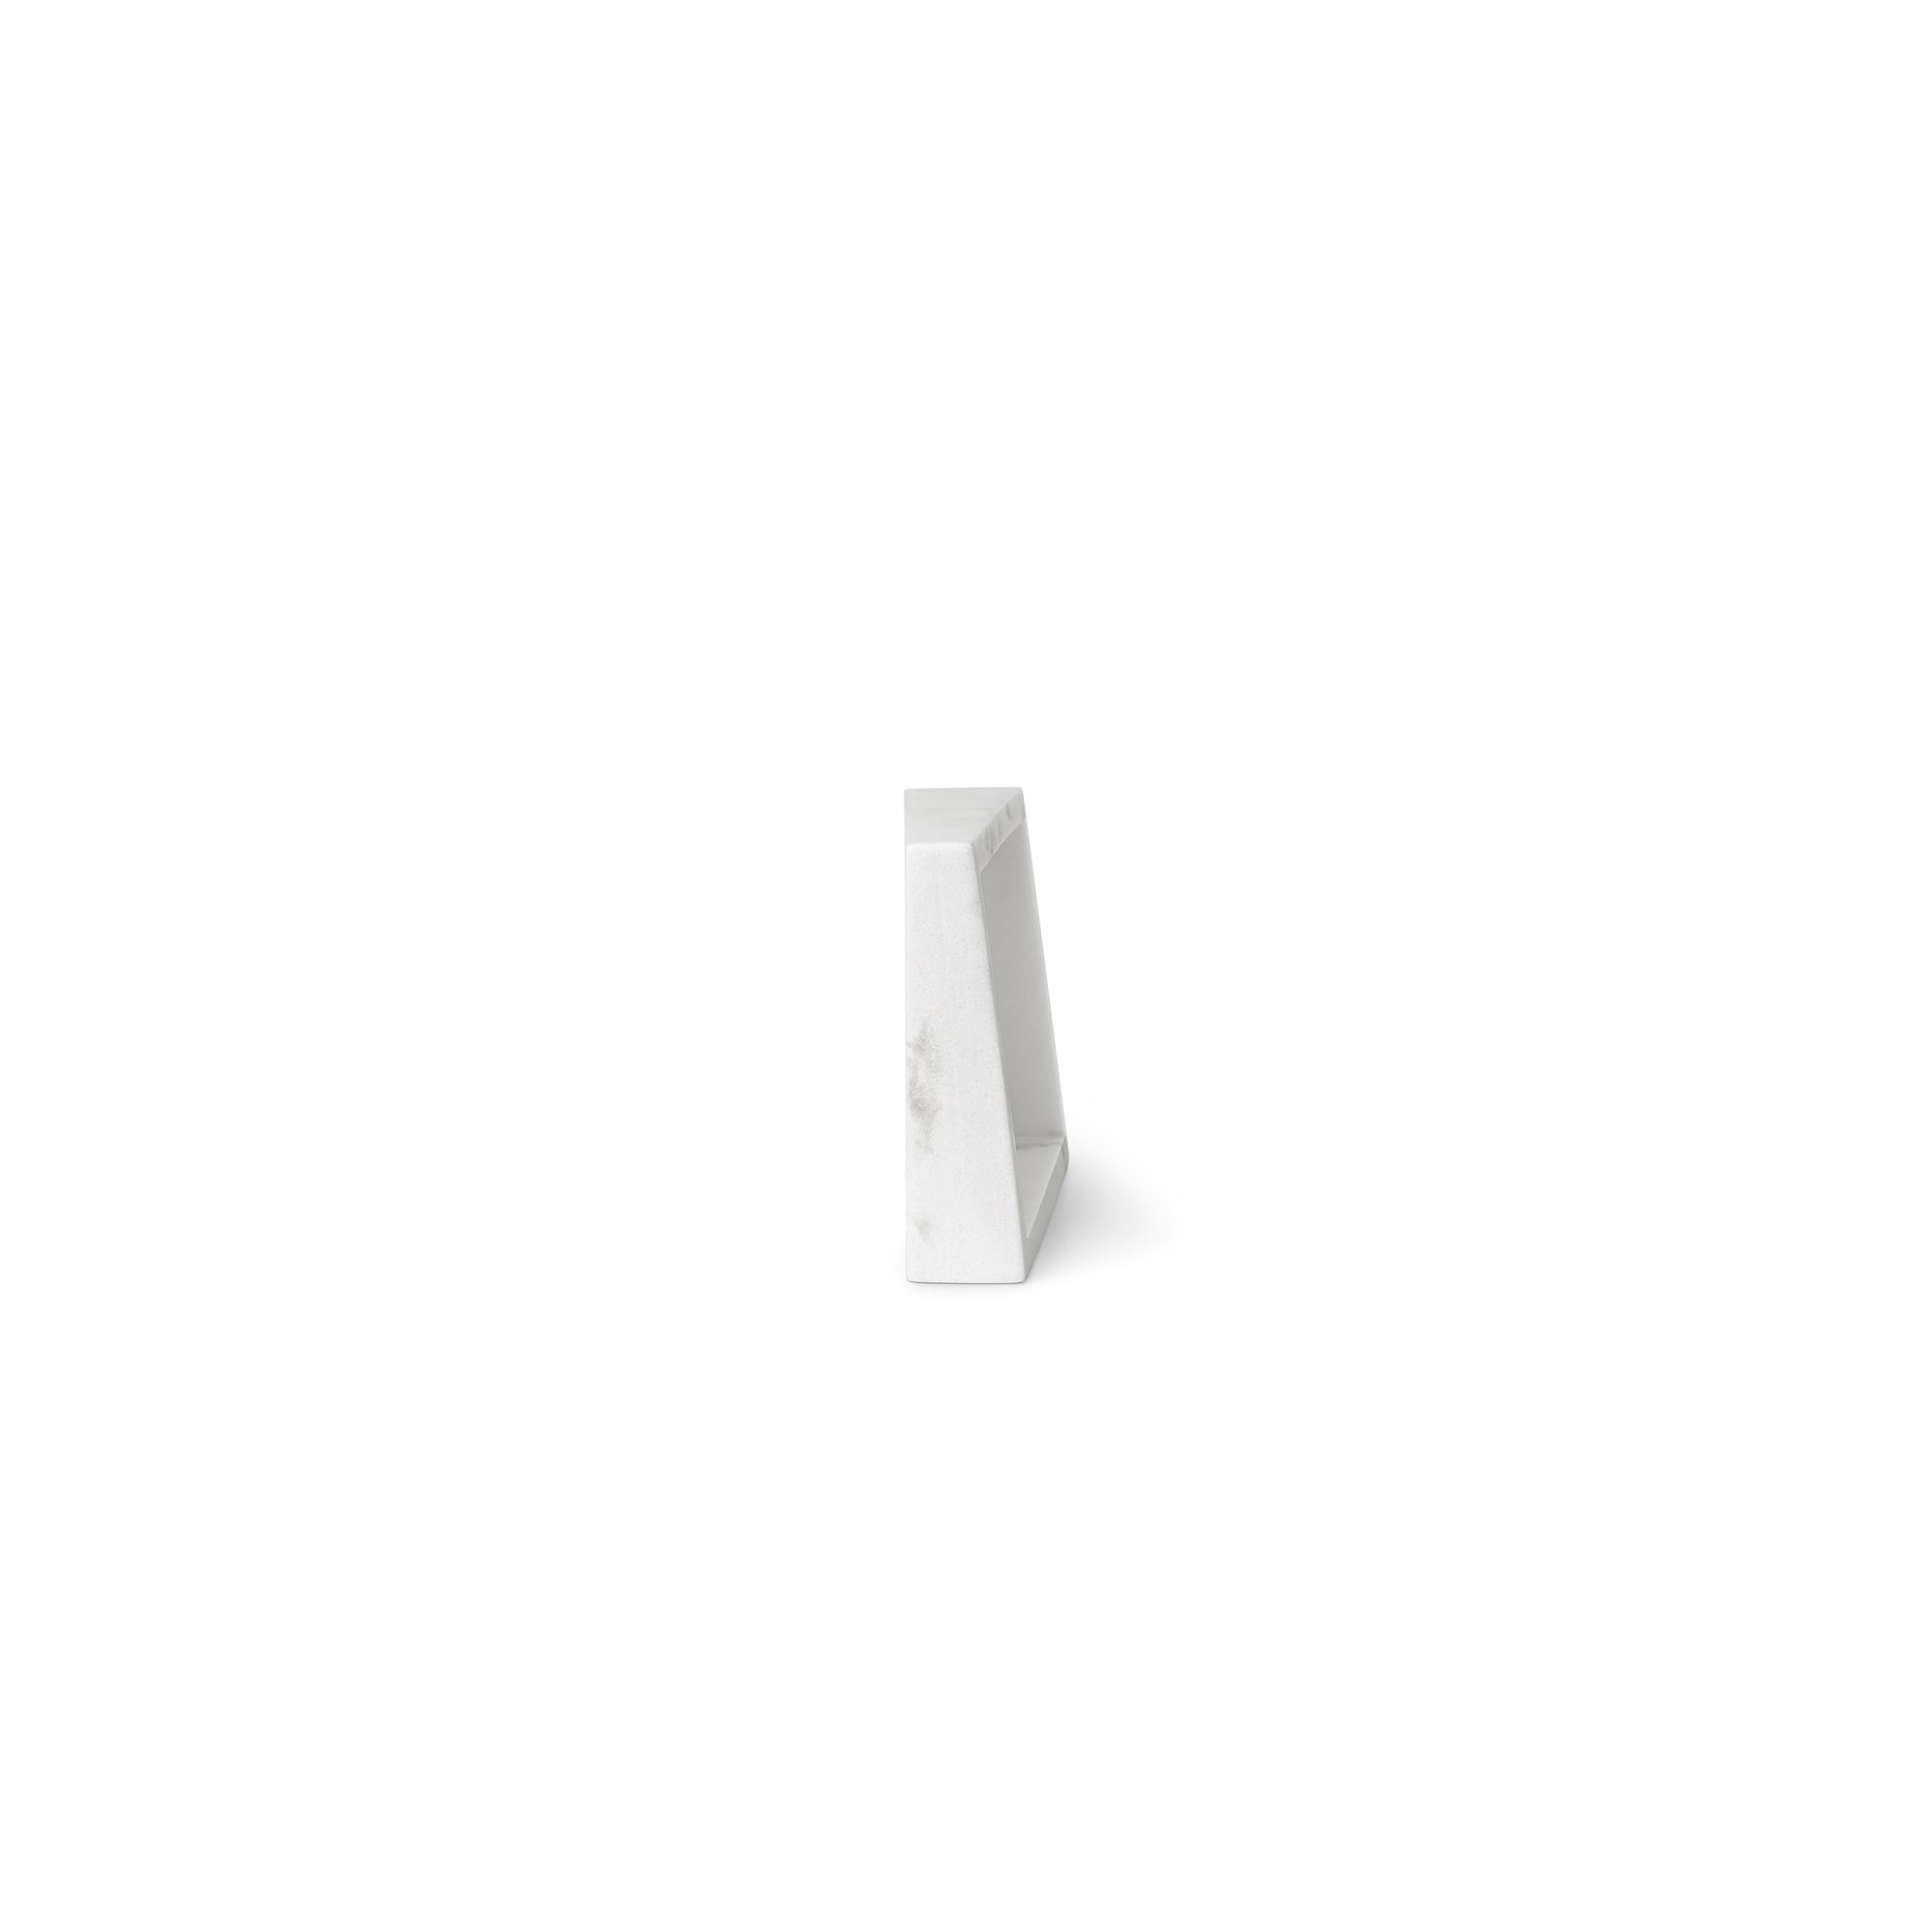 Fotorámeček EDGE MARBLE 10x15 bílý mramor_1